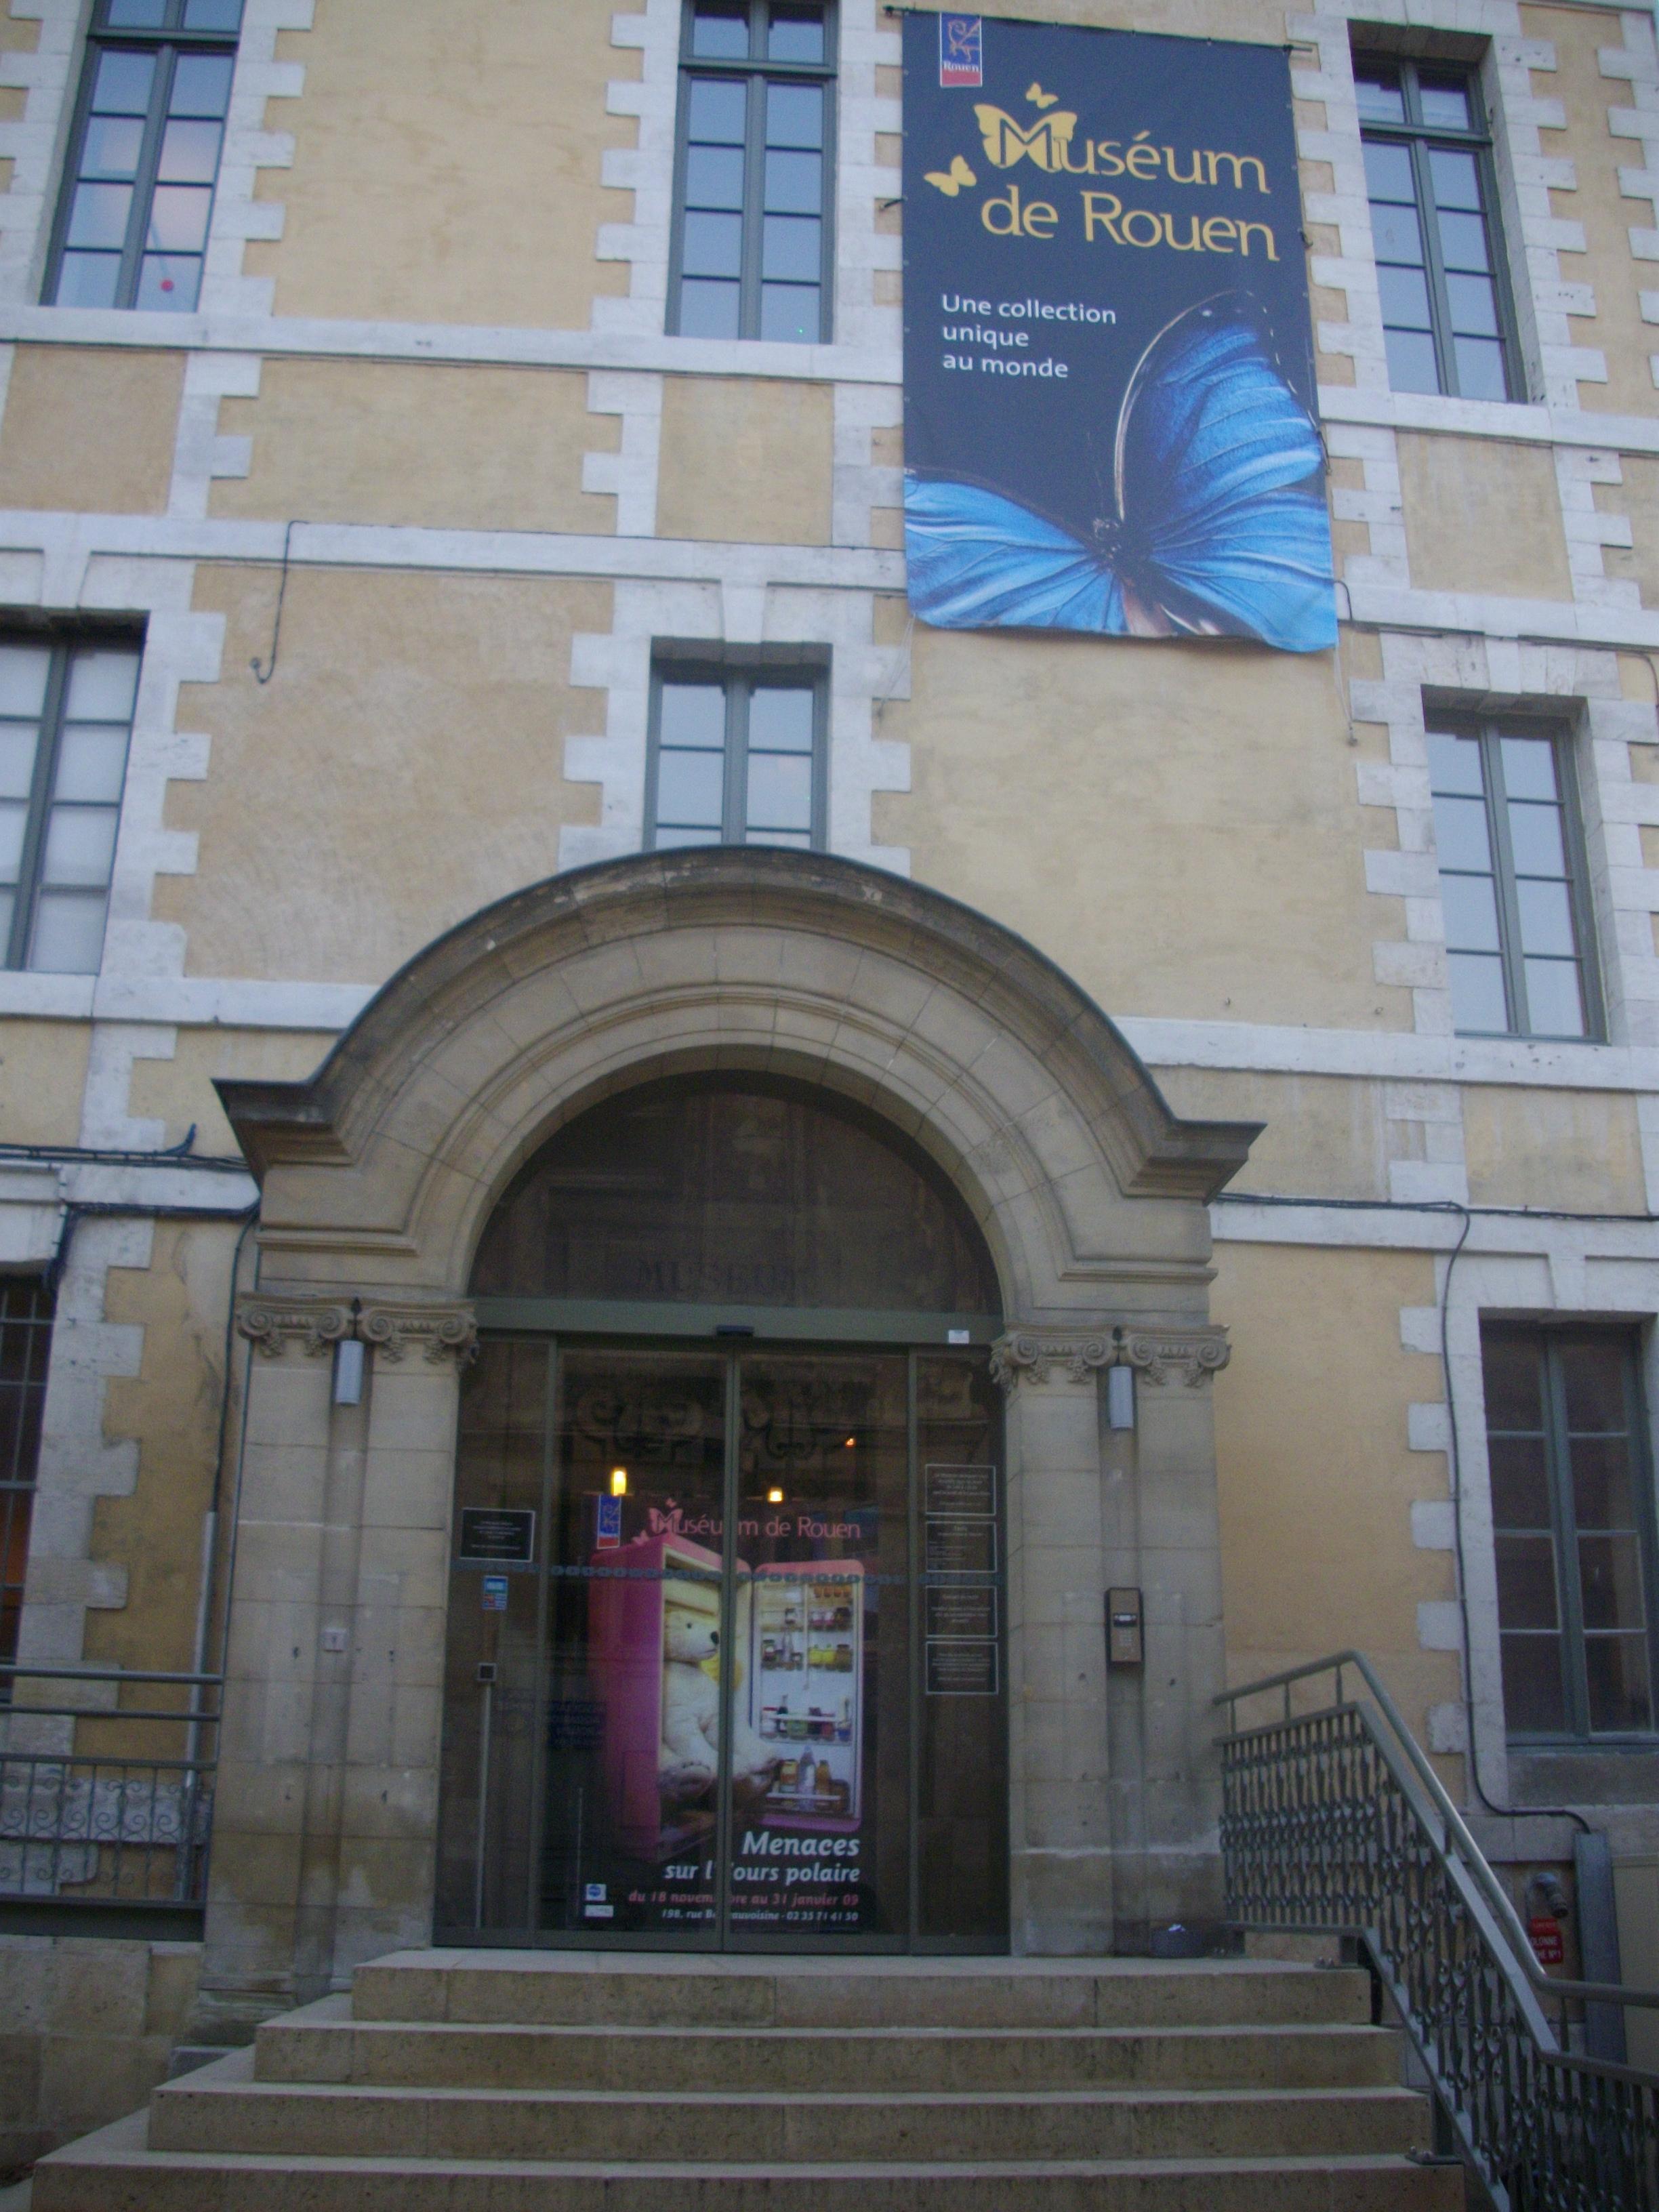 http://upload.wikimedia.org/wikipedia/commons/f/f5/Mus%C3%A9e_de_Rouen.JPG